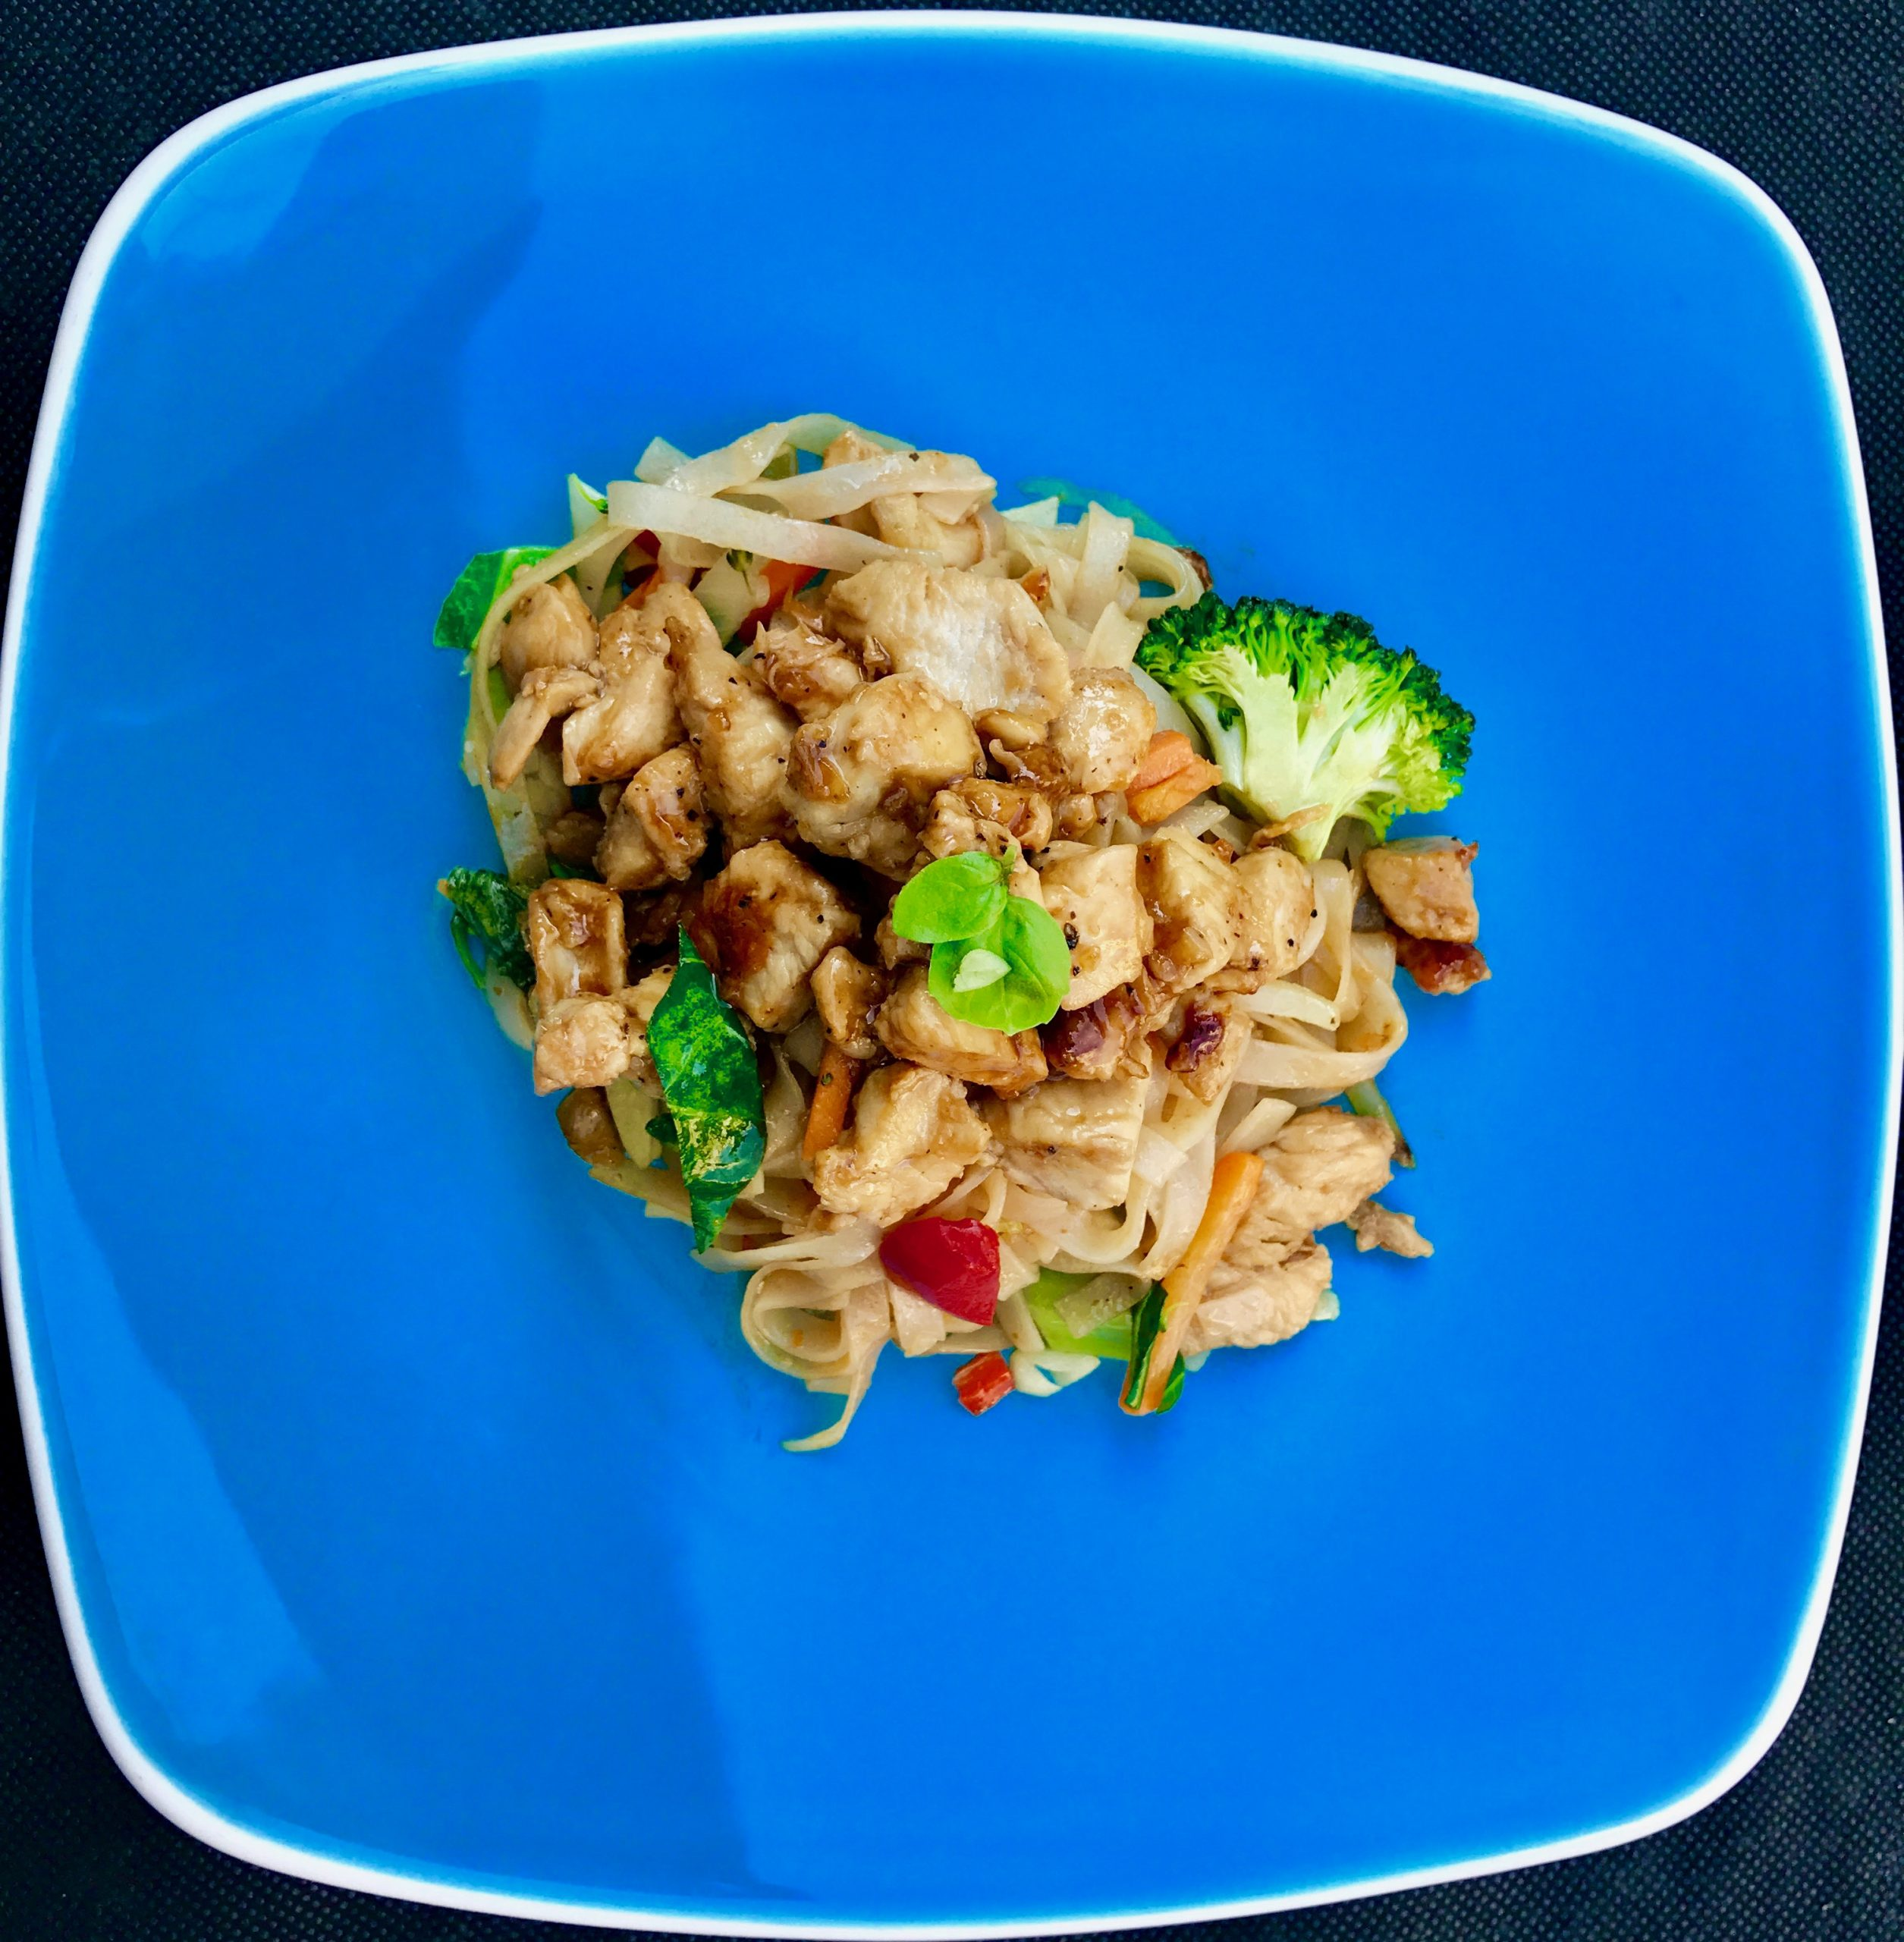 Enjoy Thai food